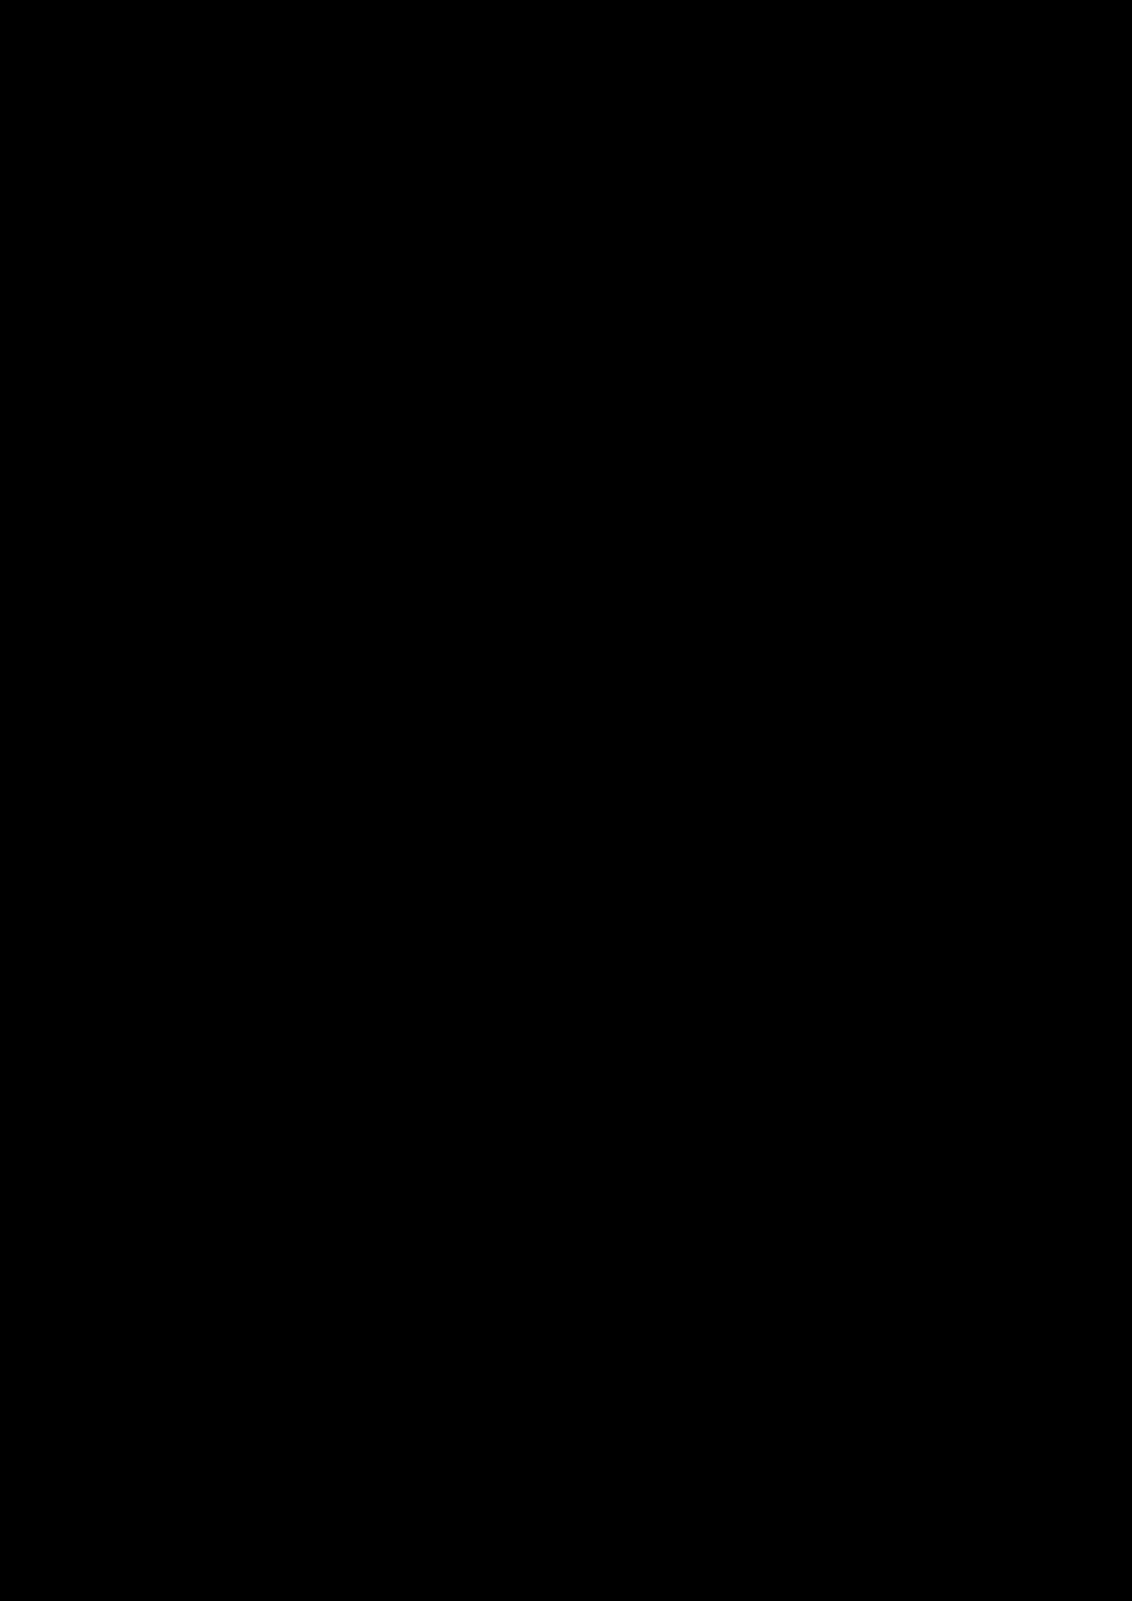 Belyiy sokol slide, Image 51